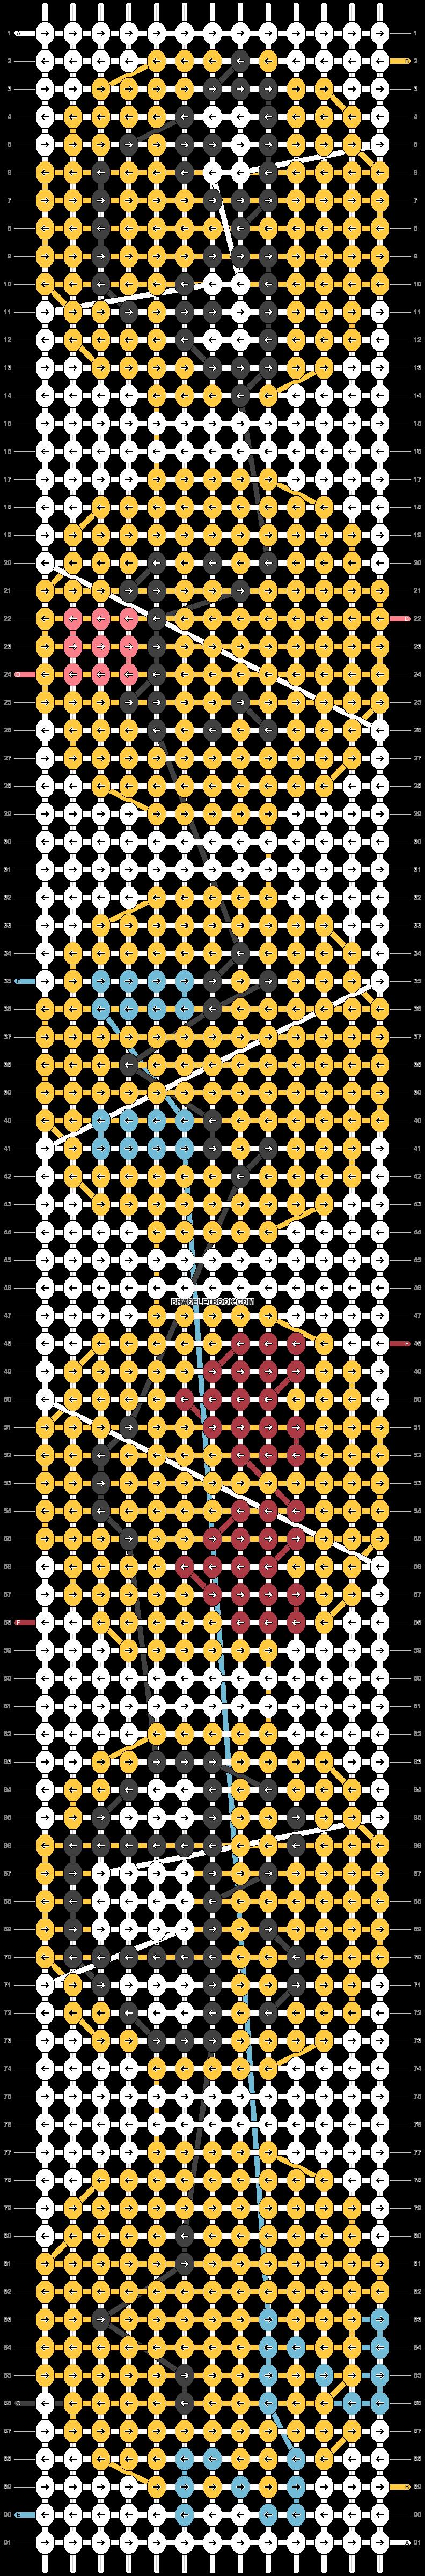 Alpha pattern #23869 pattern